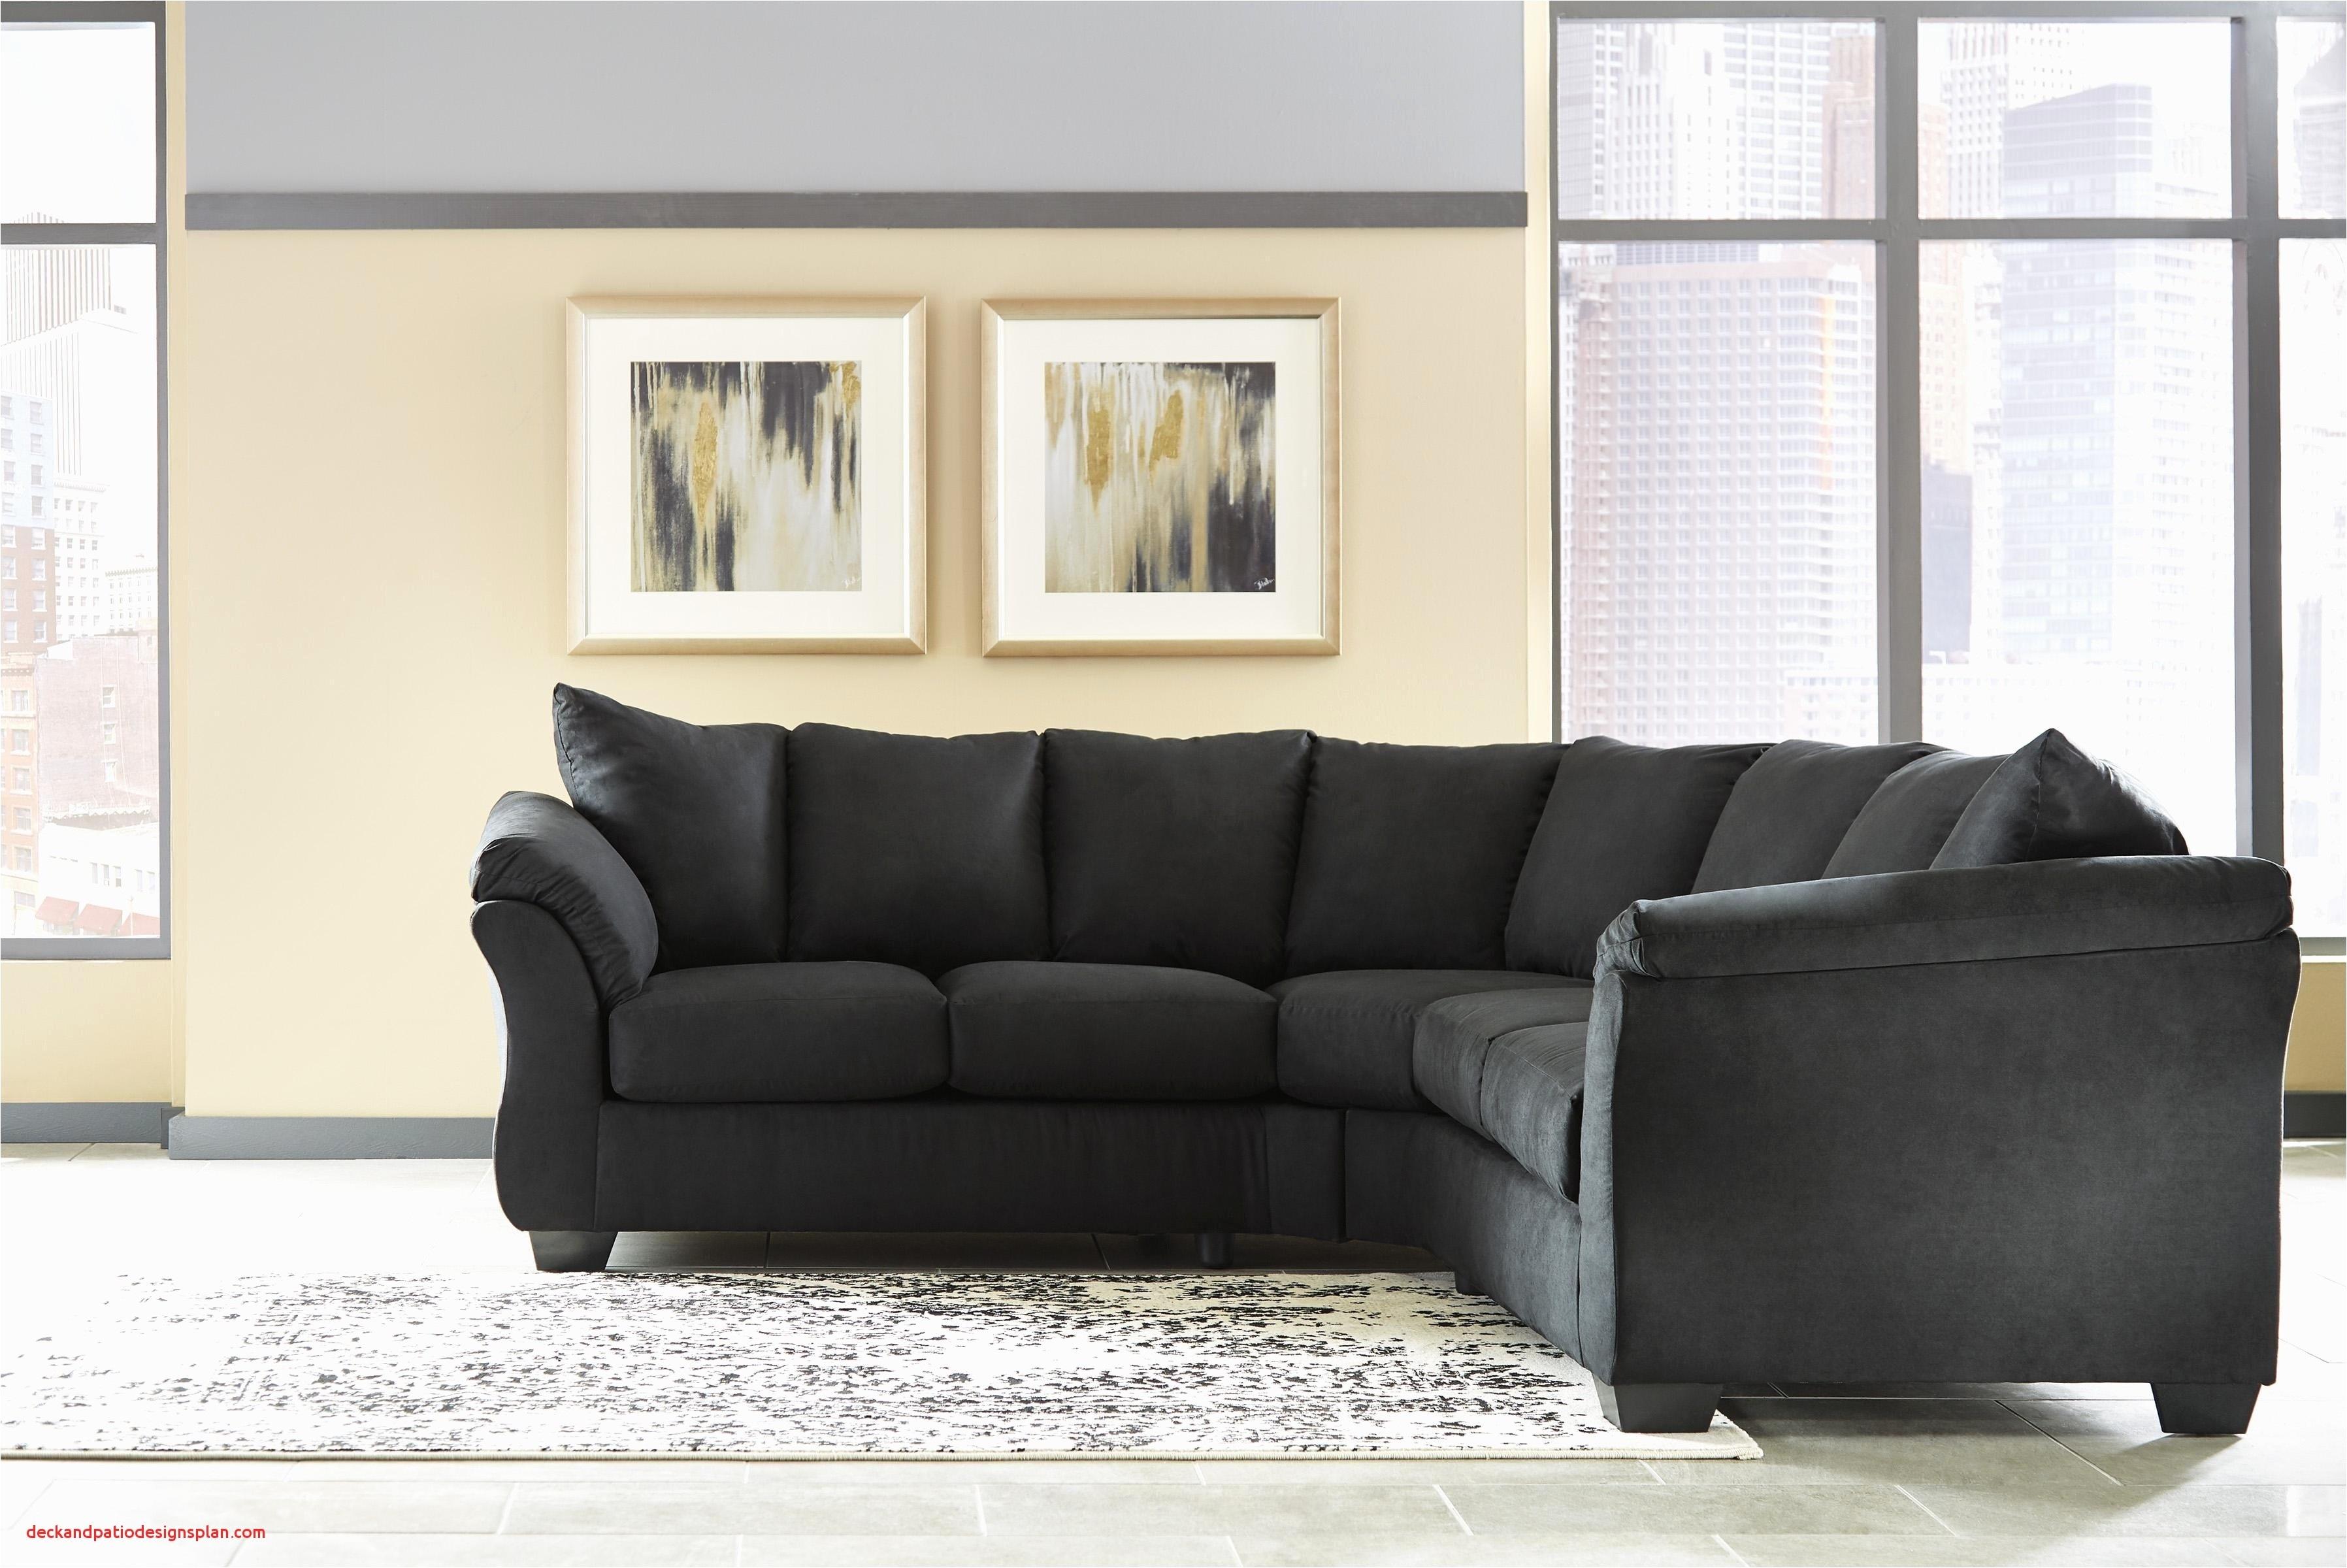 Macy S Furniture Warehouse Catchy Macys Home Furniture In sofa Chairs Inspirational Gunstiges